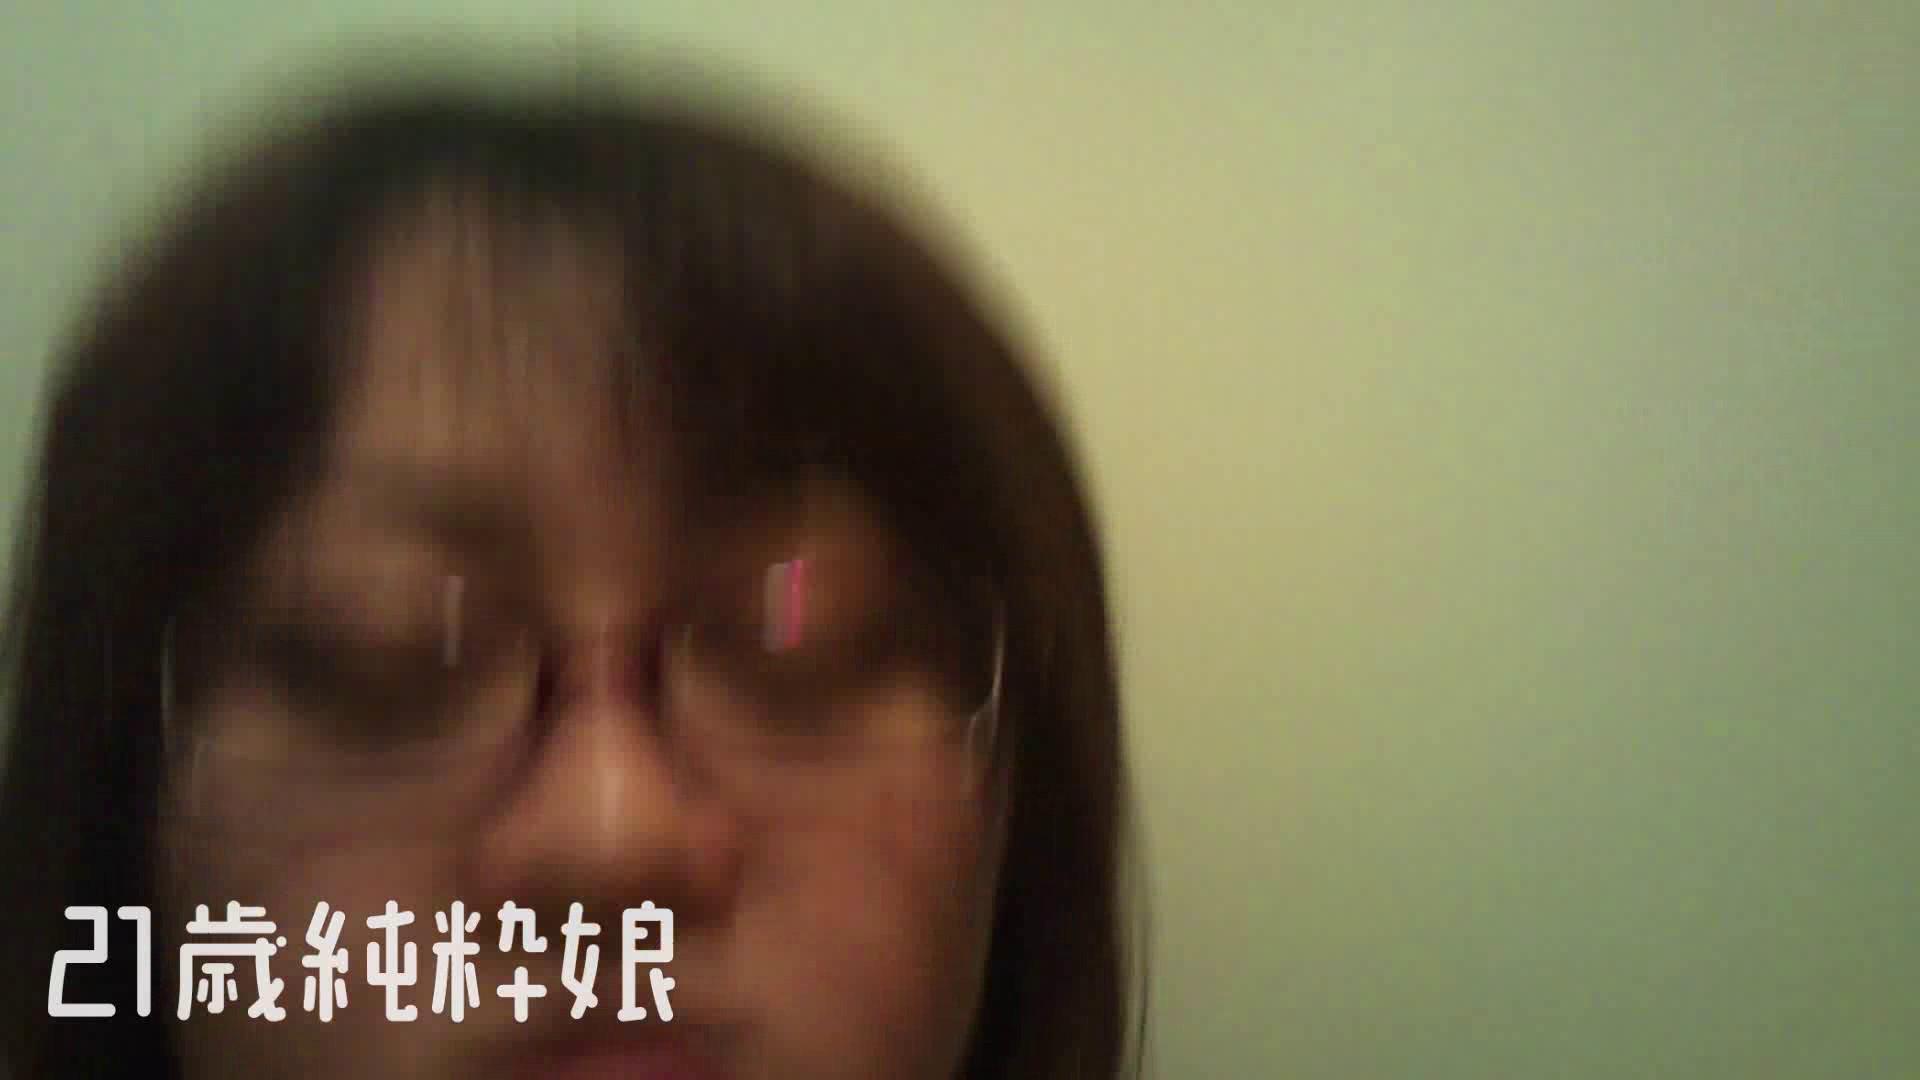 Gカップ21歳純粋嬢第2弾Vol.5 美女OL  78連発 14